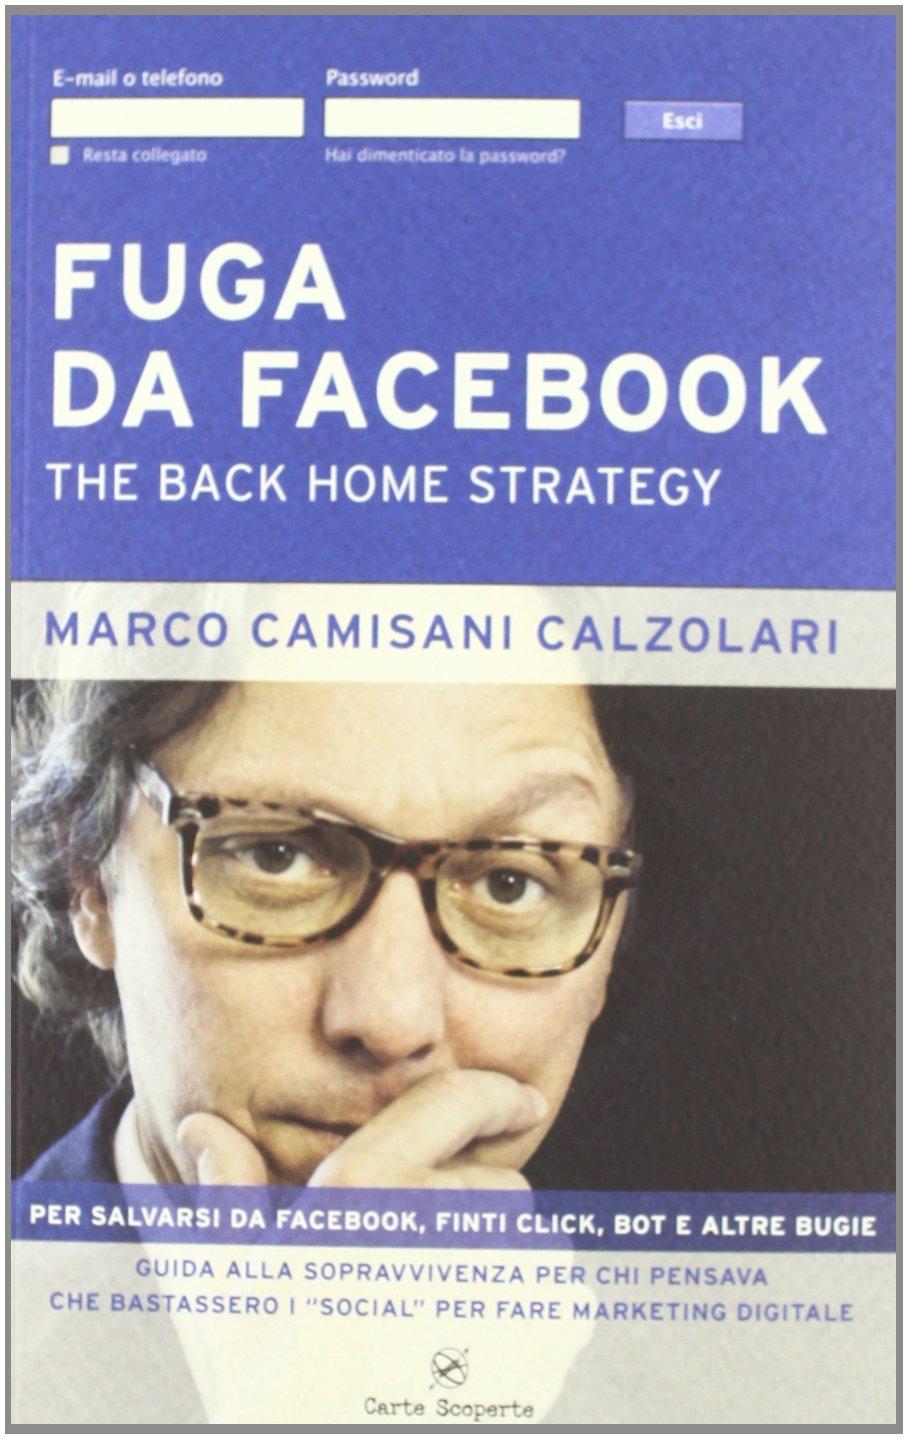 Fuga da facebook. The back home strategy.